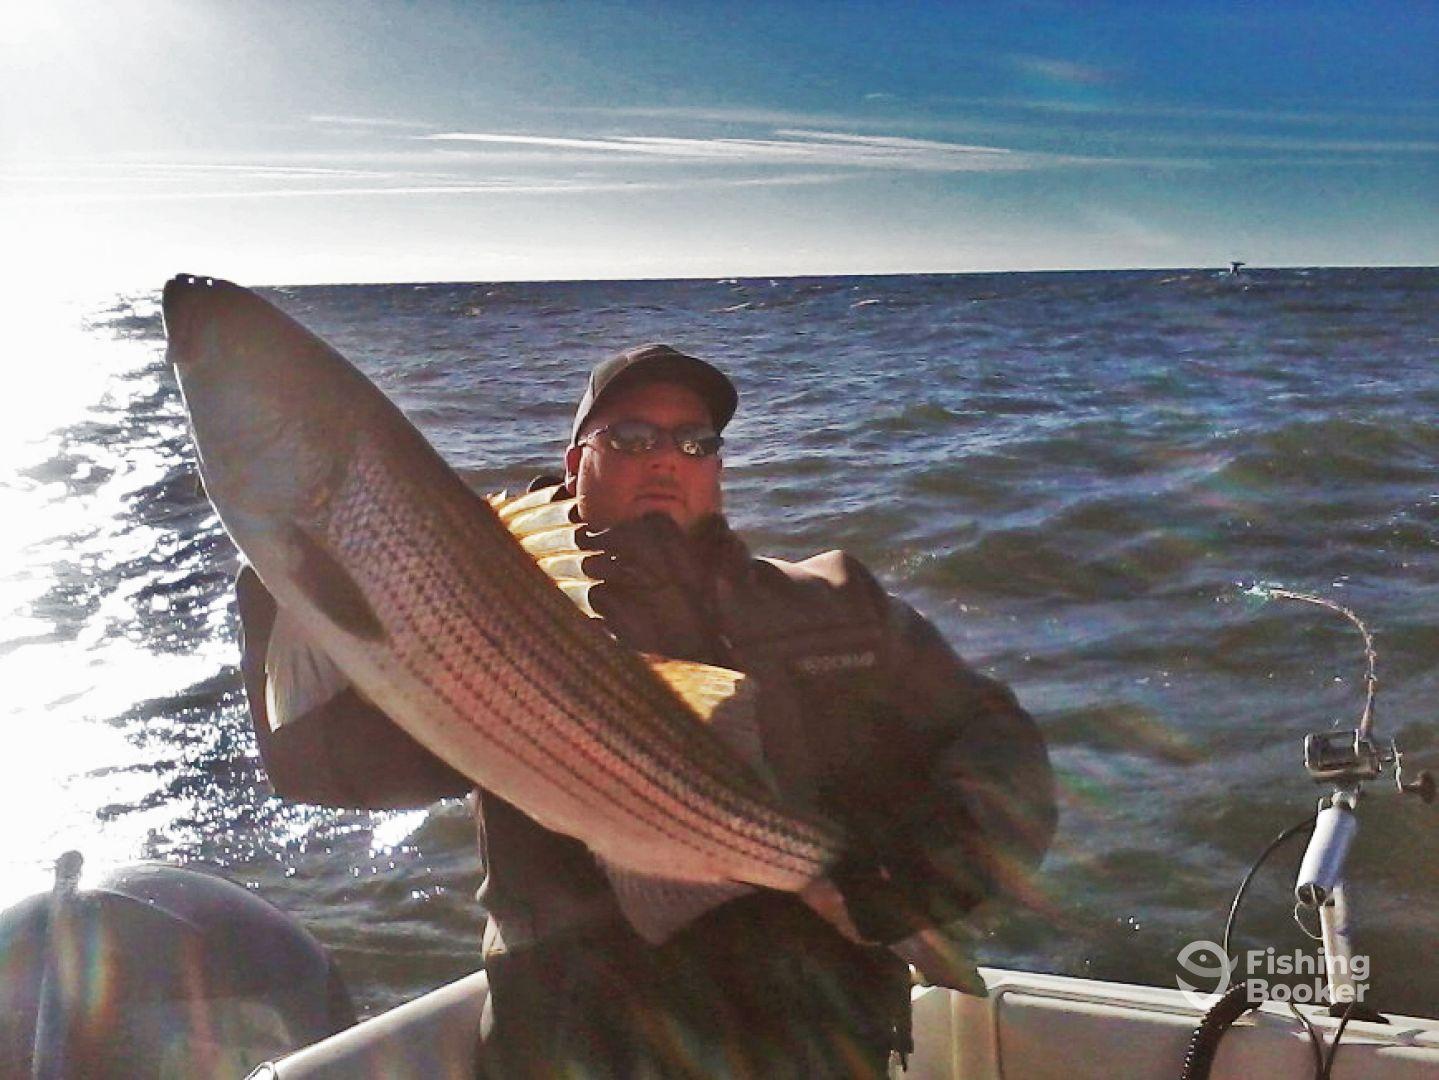 Trolling big striped bass